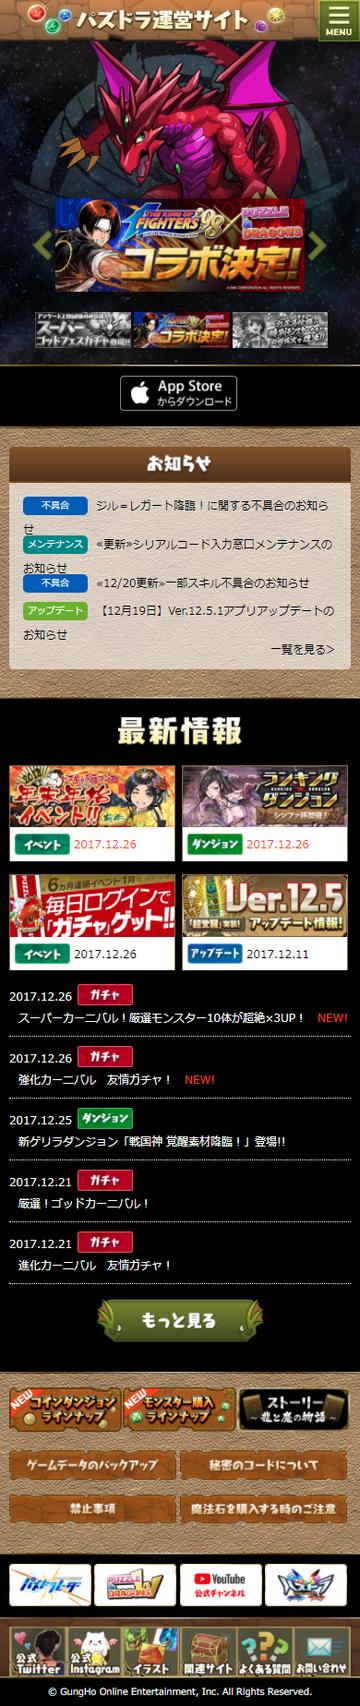 screencapture-pad-gungho-jp-member-index-html-1514381036588